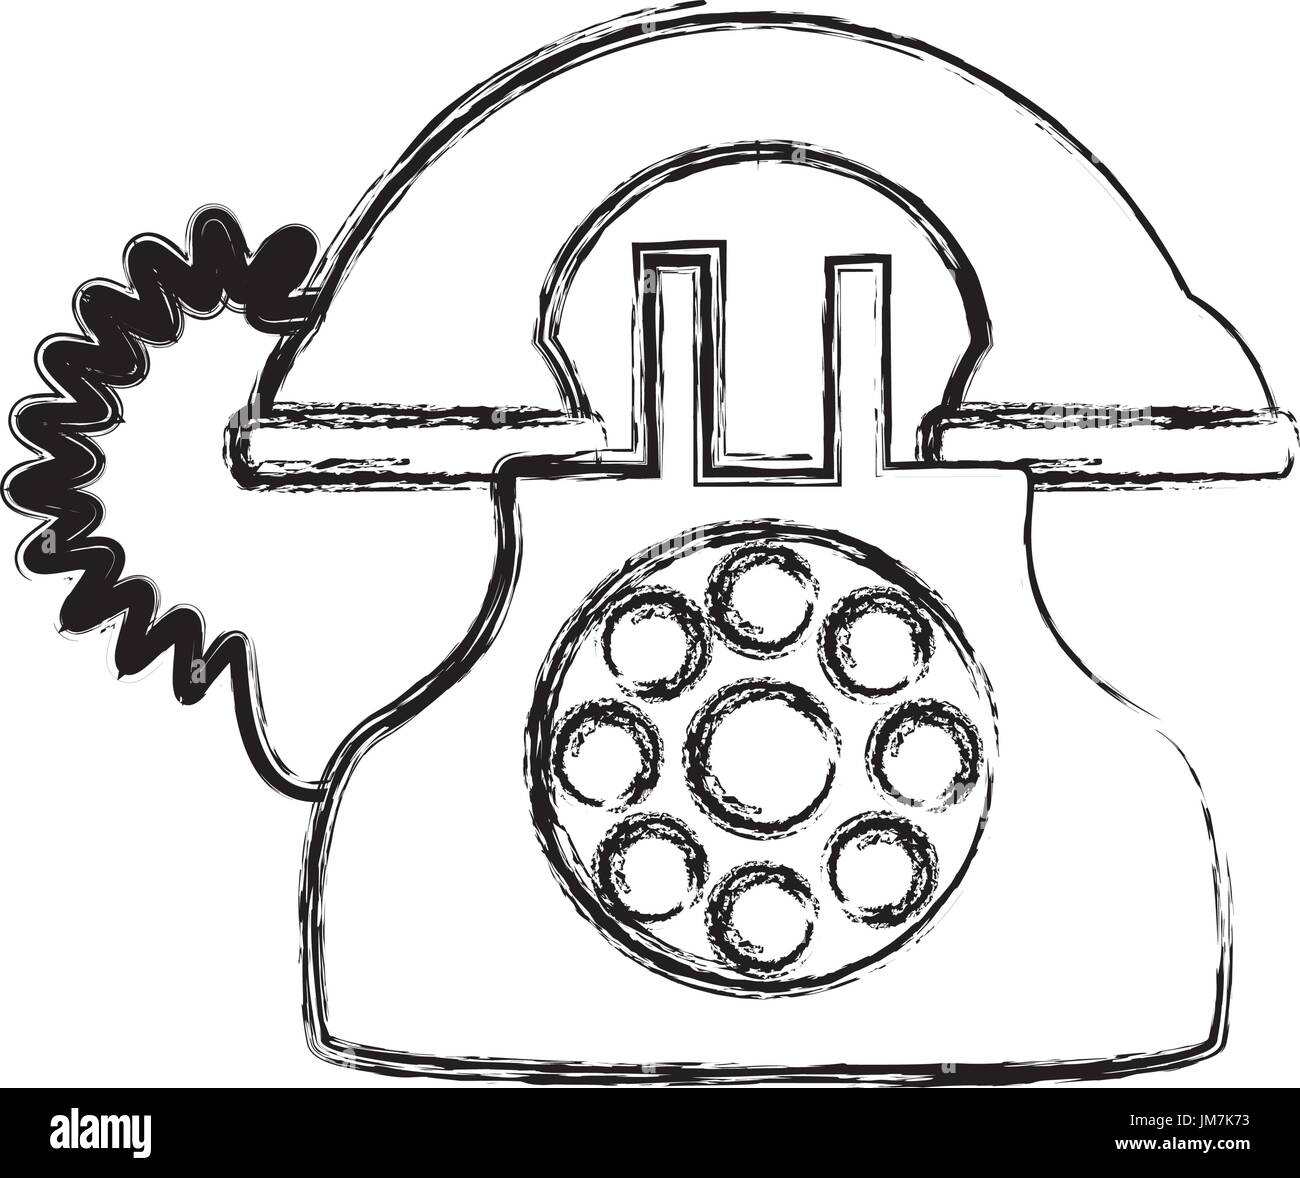 sketch telephone stock photos u0026 sketch telephone stock images alamy